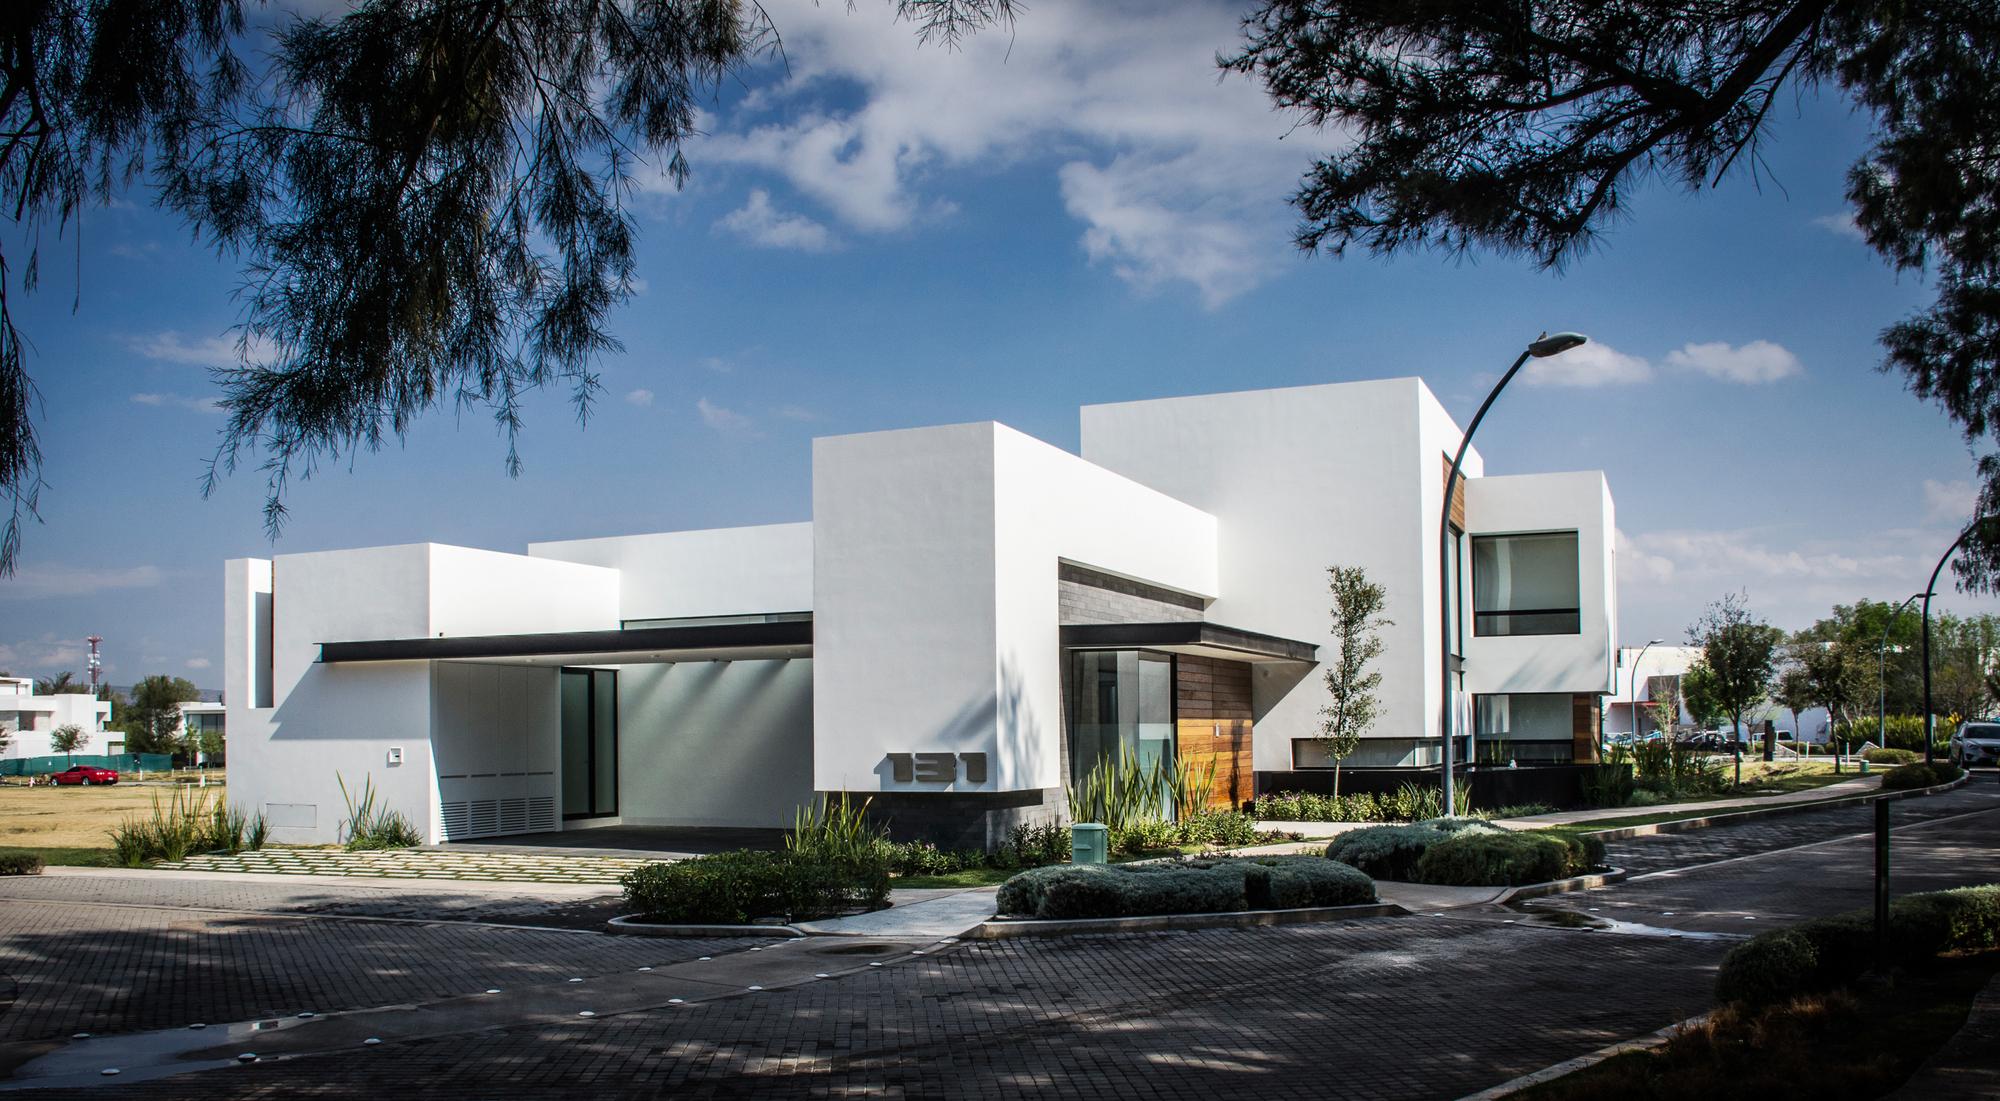 Galer a de casa agr adi arquitectura y dise o interior 4 for Arquitectura y diseno interior